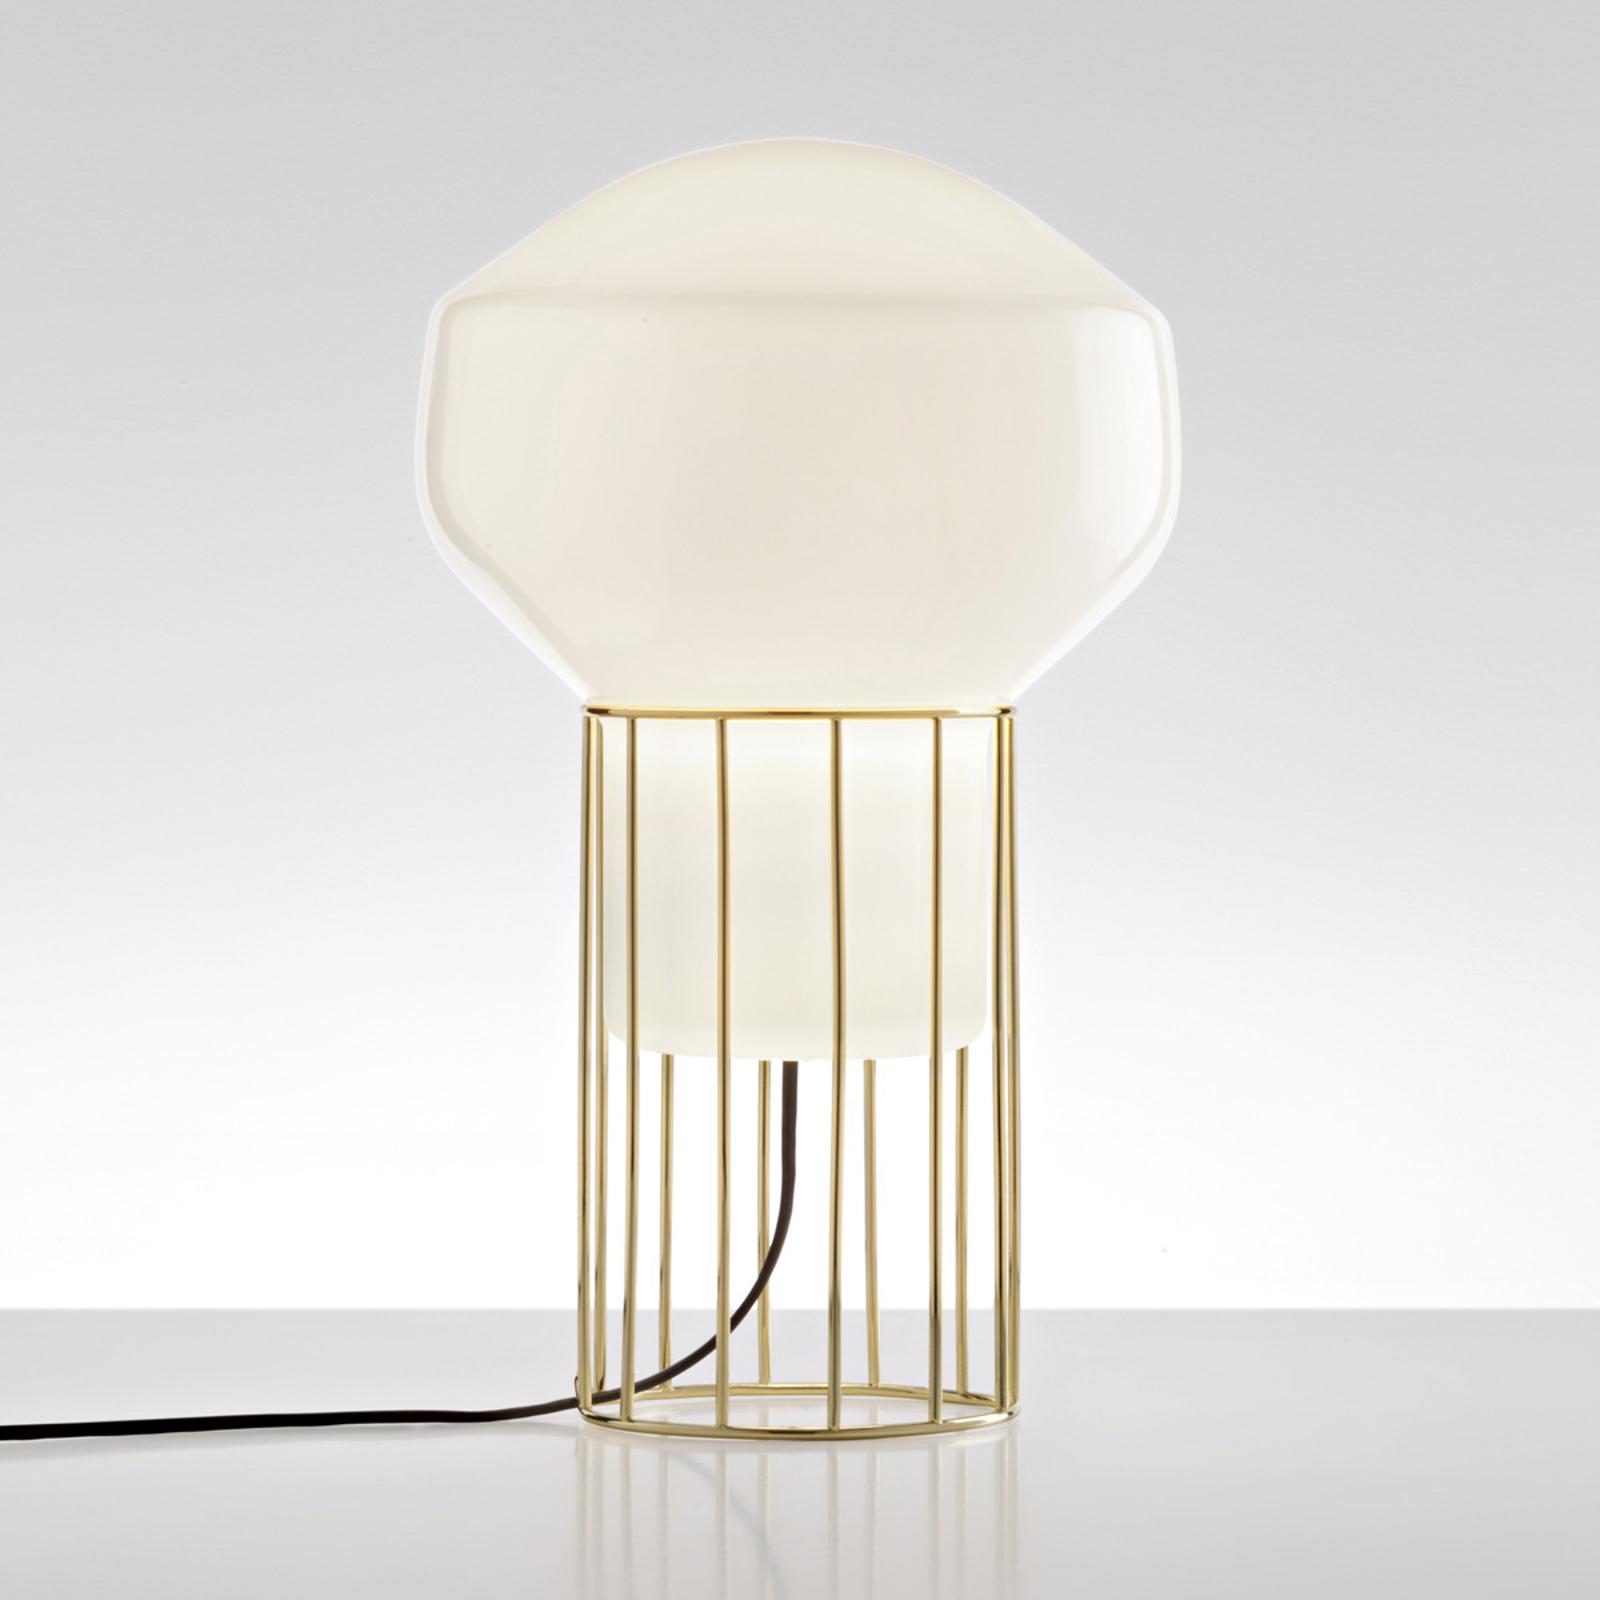 Design tafellamp Aérostat met messing voet 23cm